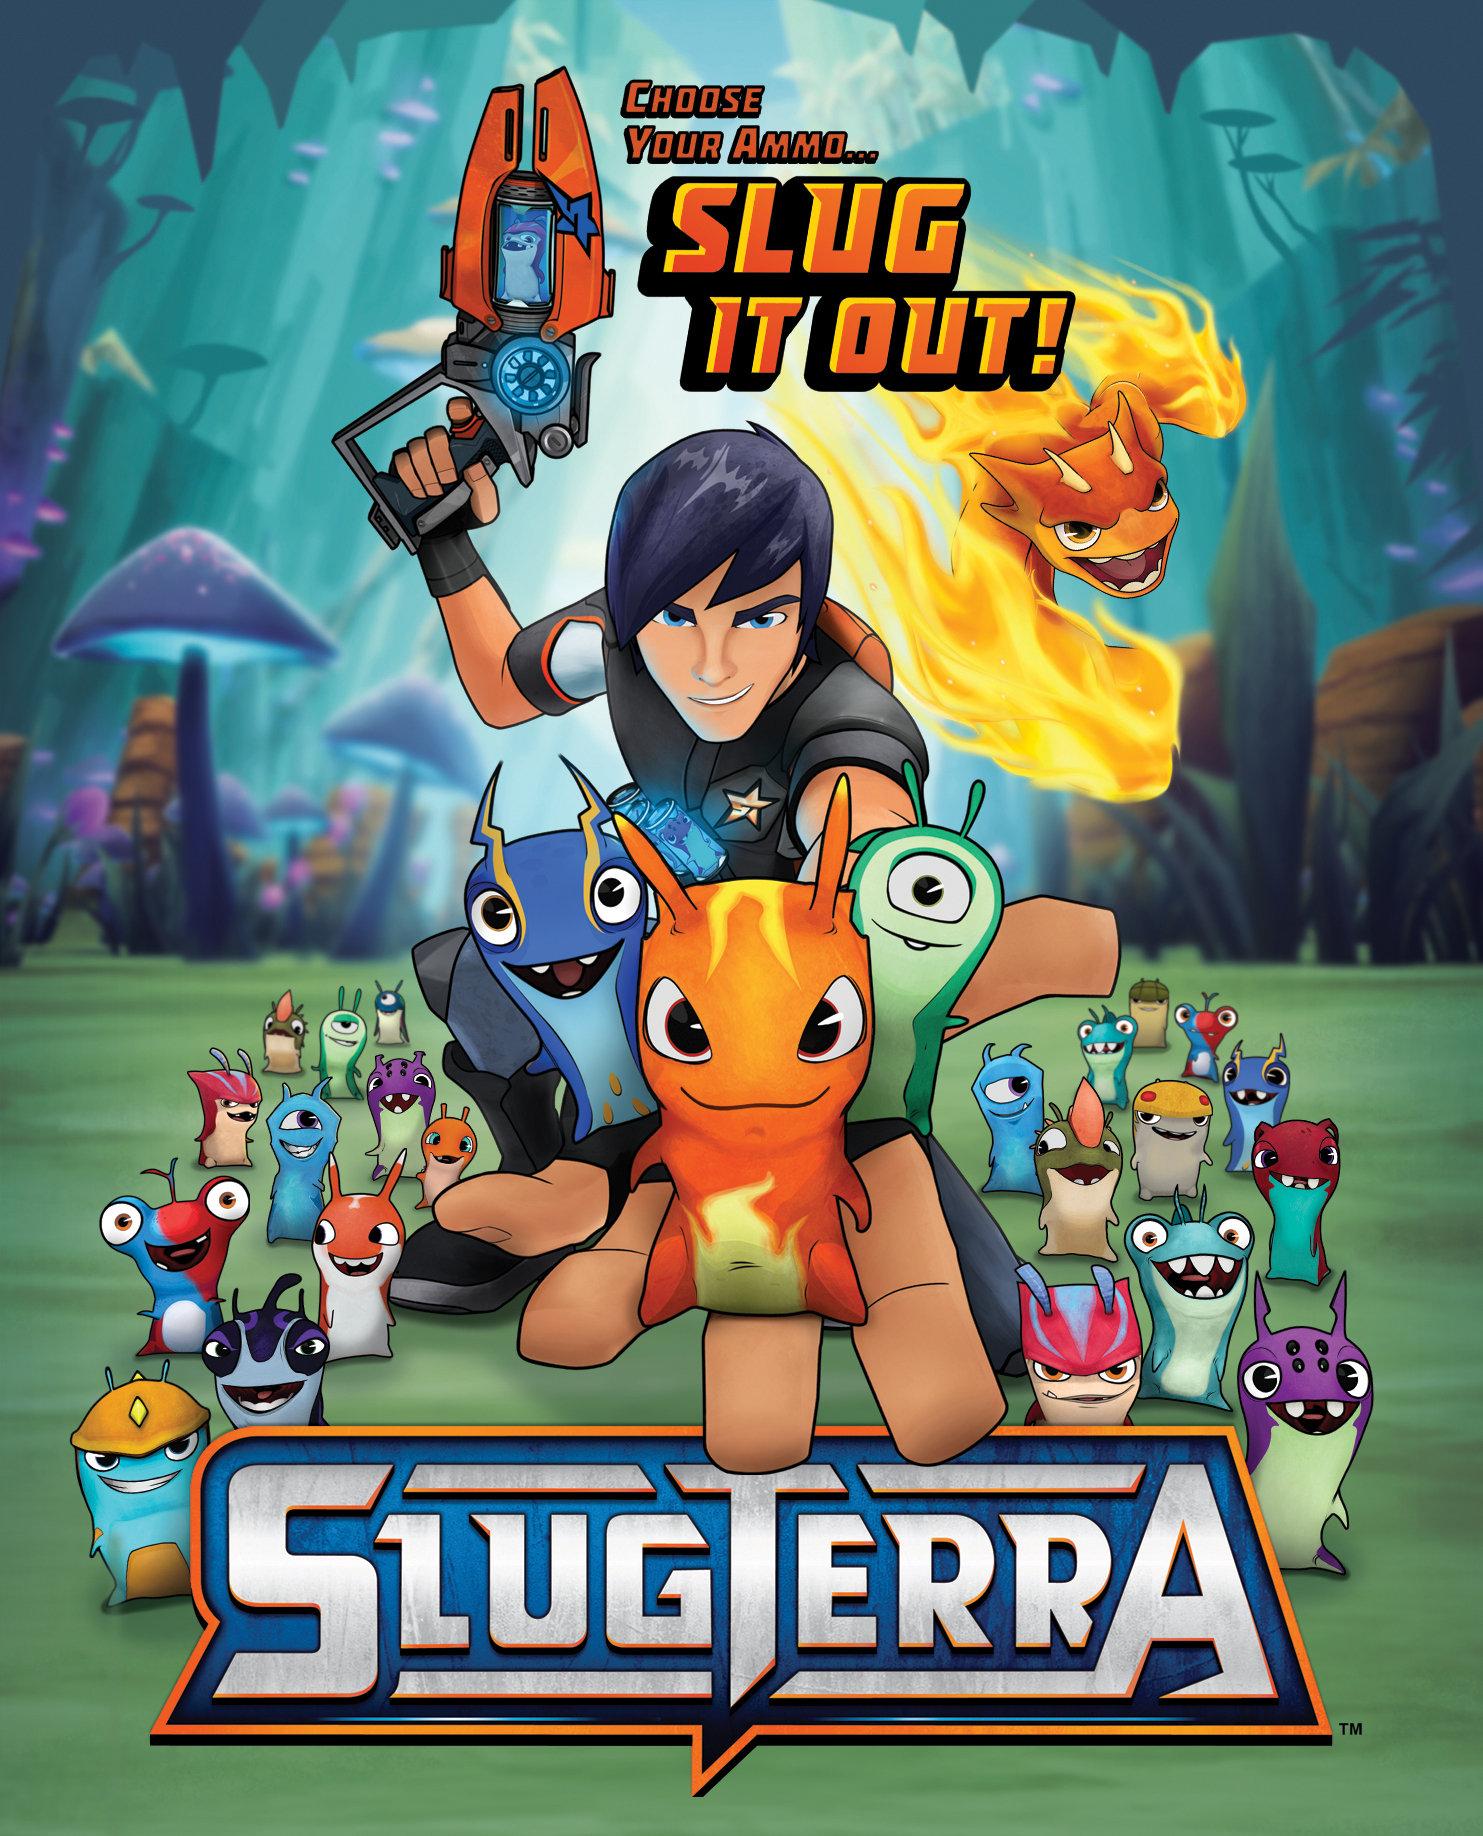 slugterra into the shadows full movie in hindi download